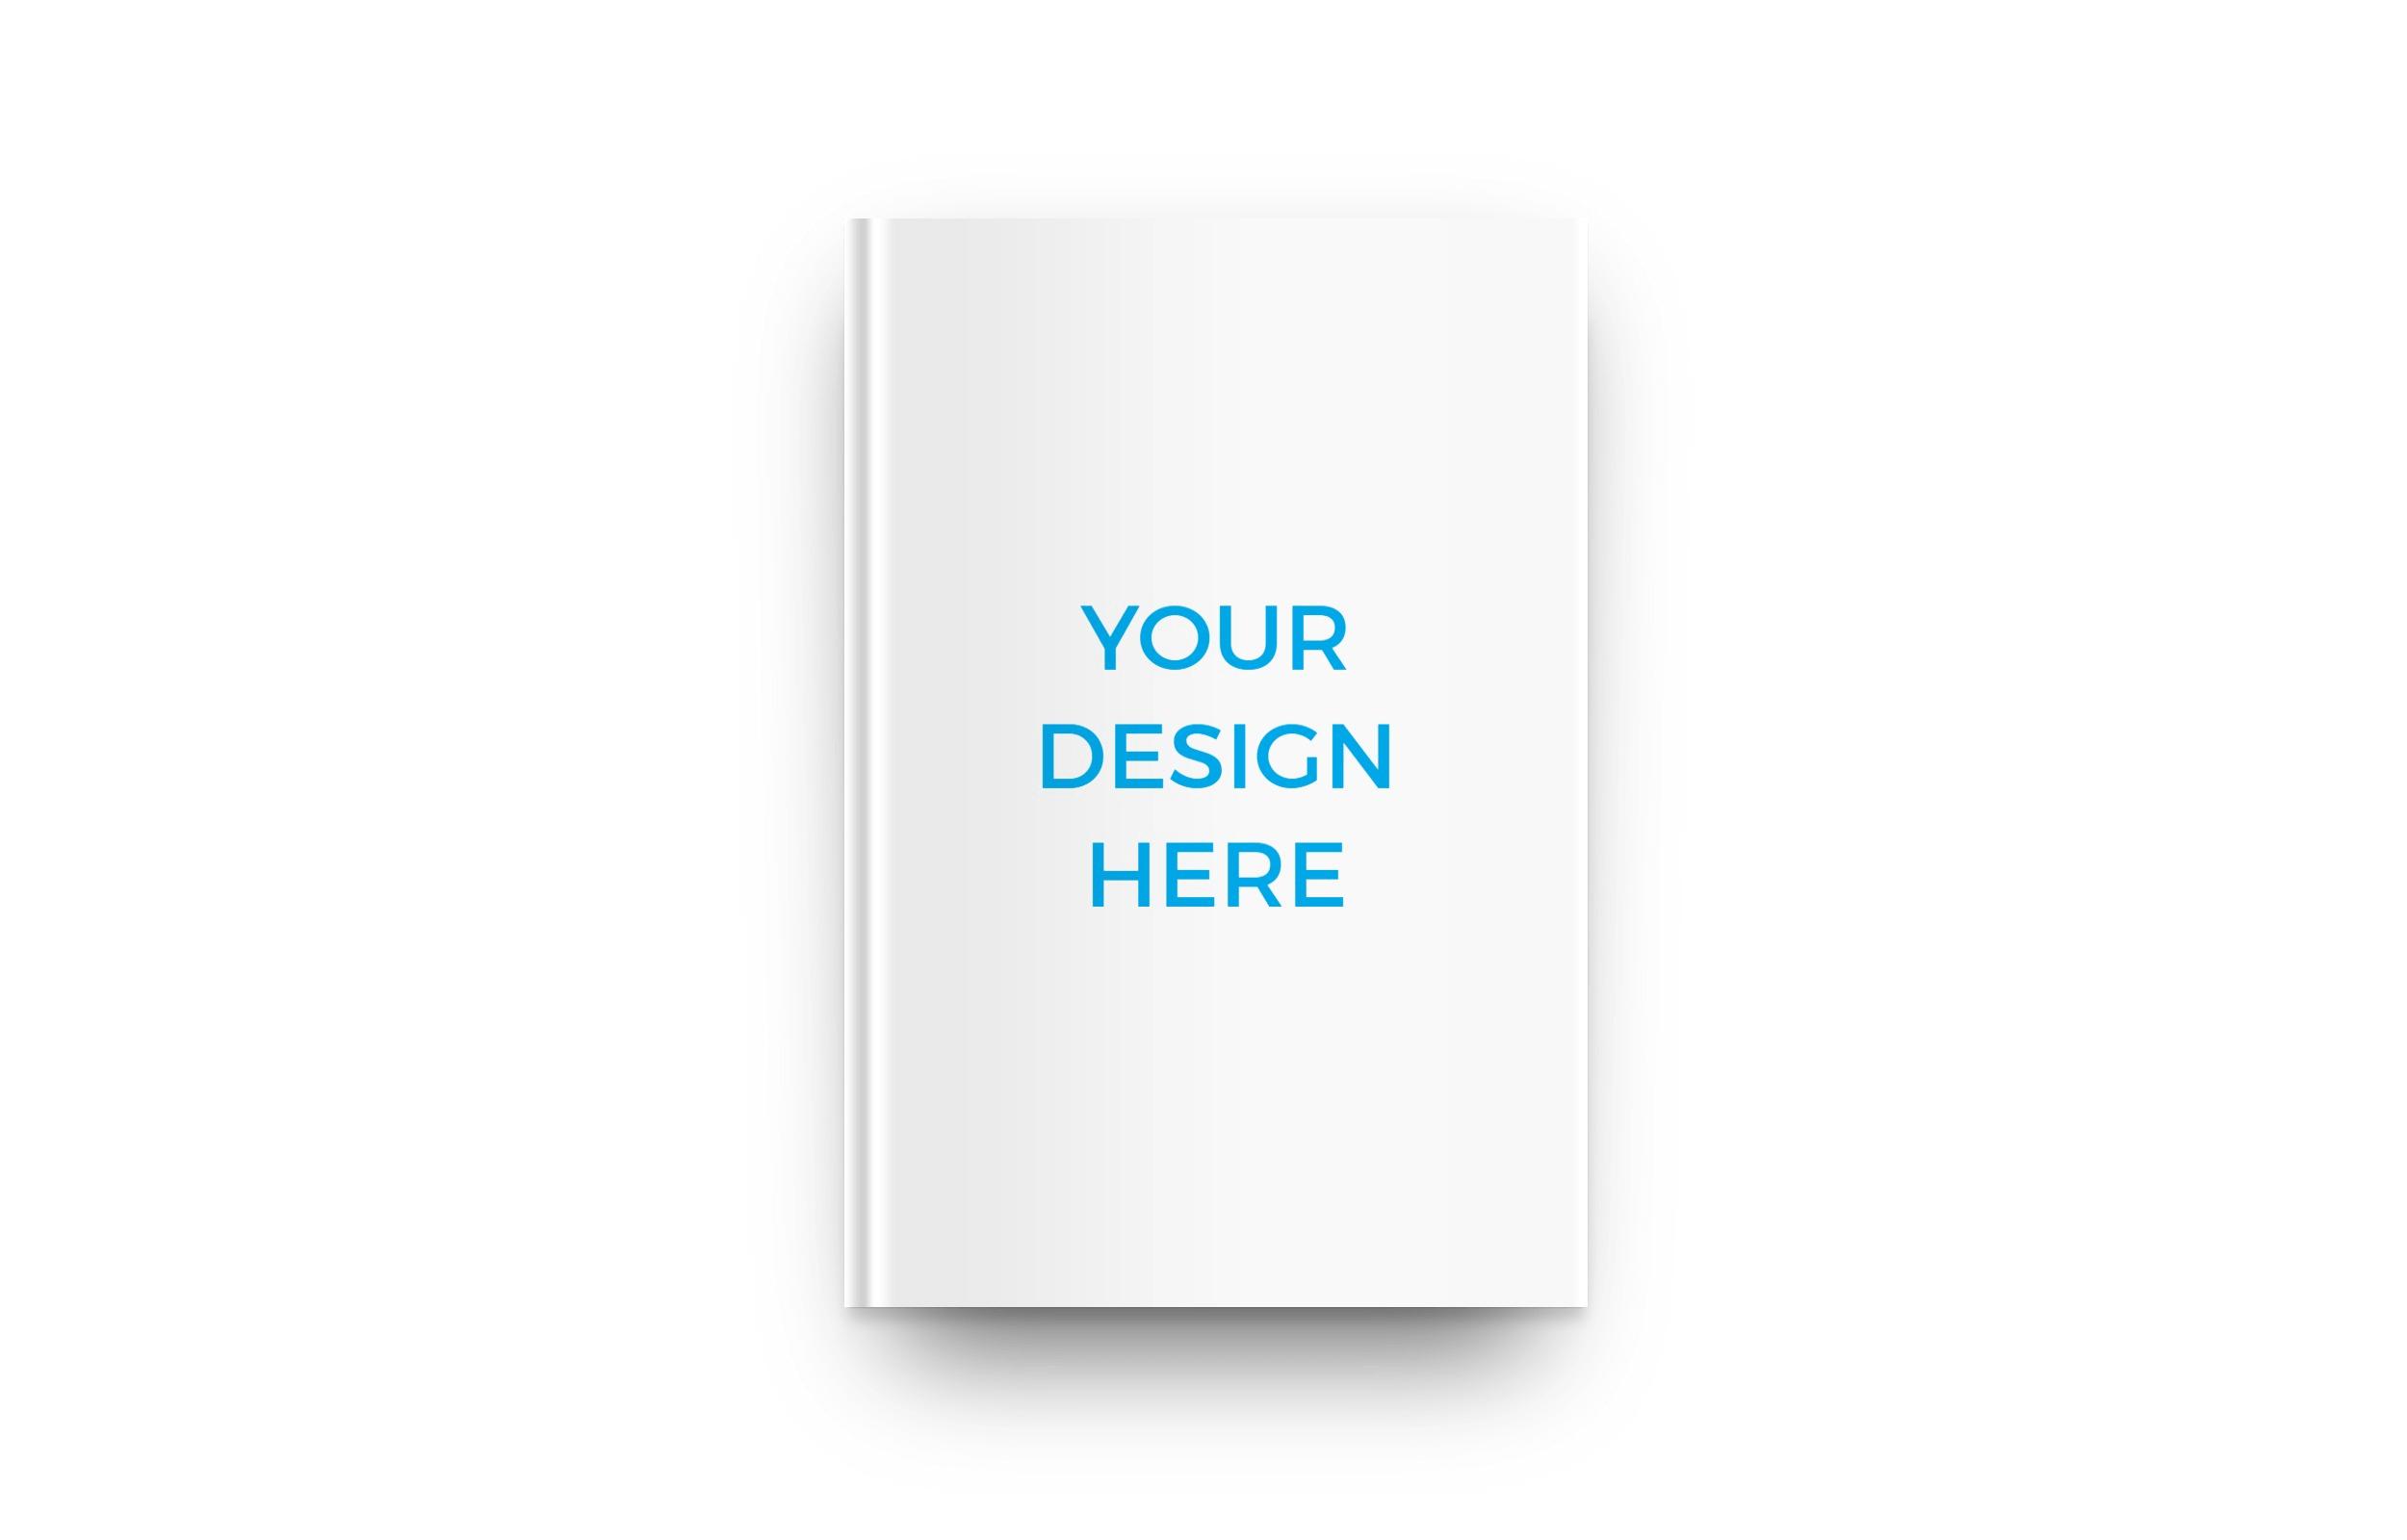 Smartmockups livro impresso de capa dura deitado visto de cima